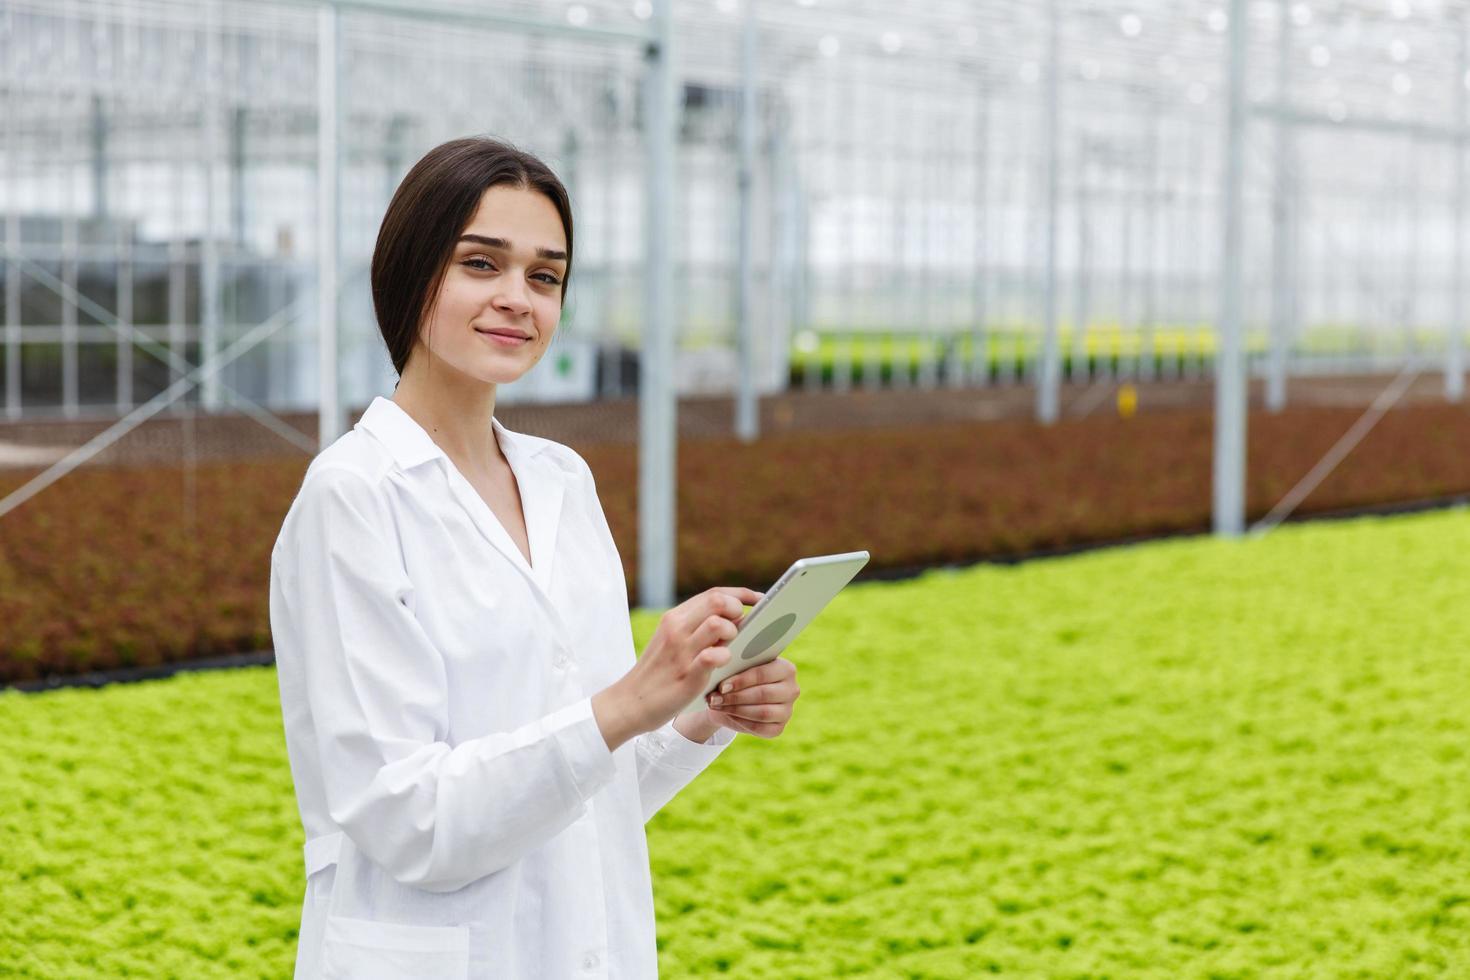 ricercatore femminile tiene un tablet foto